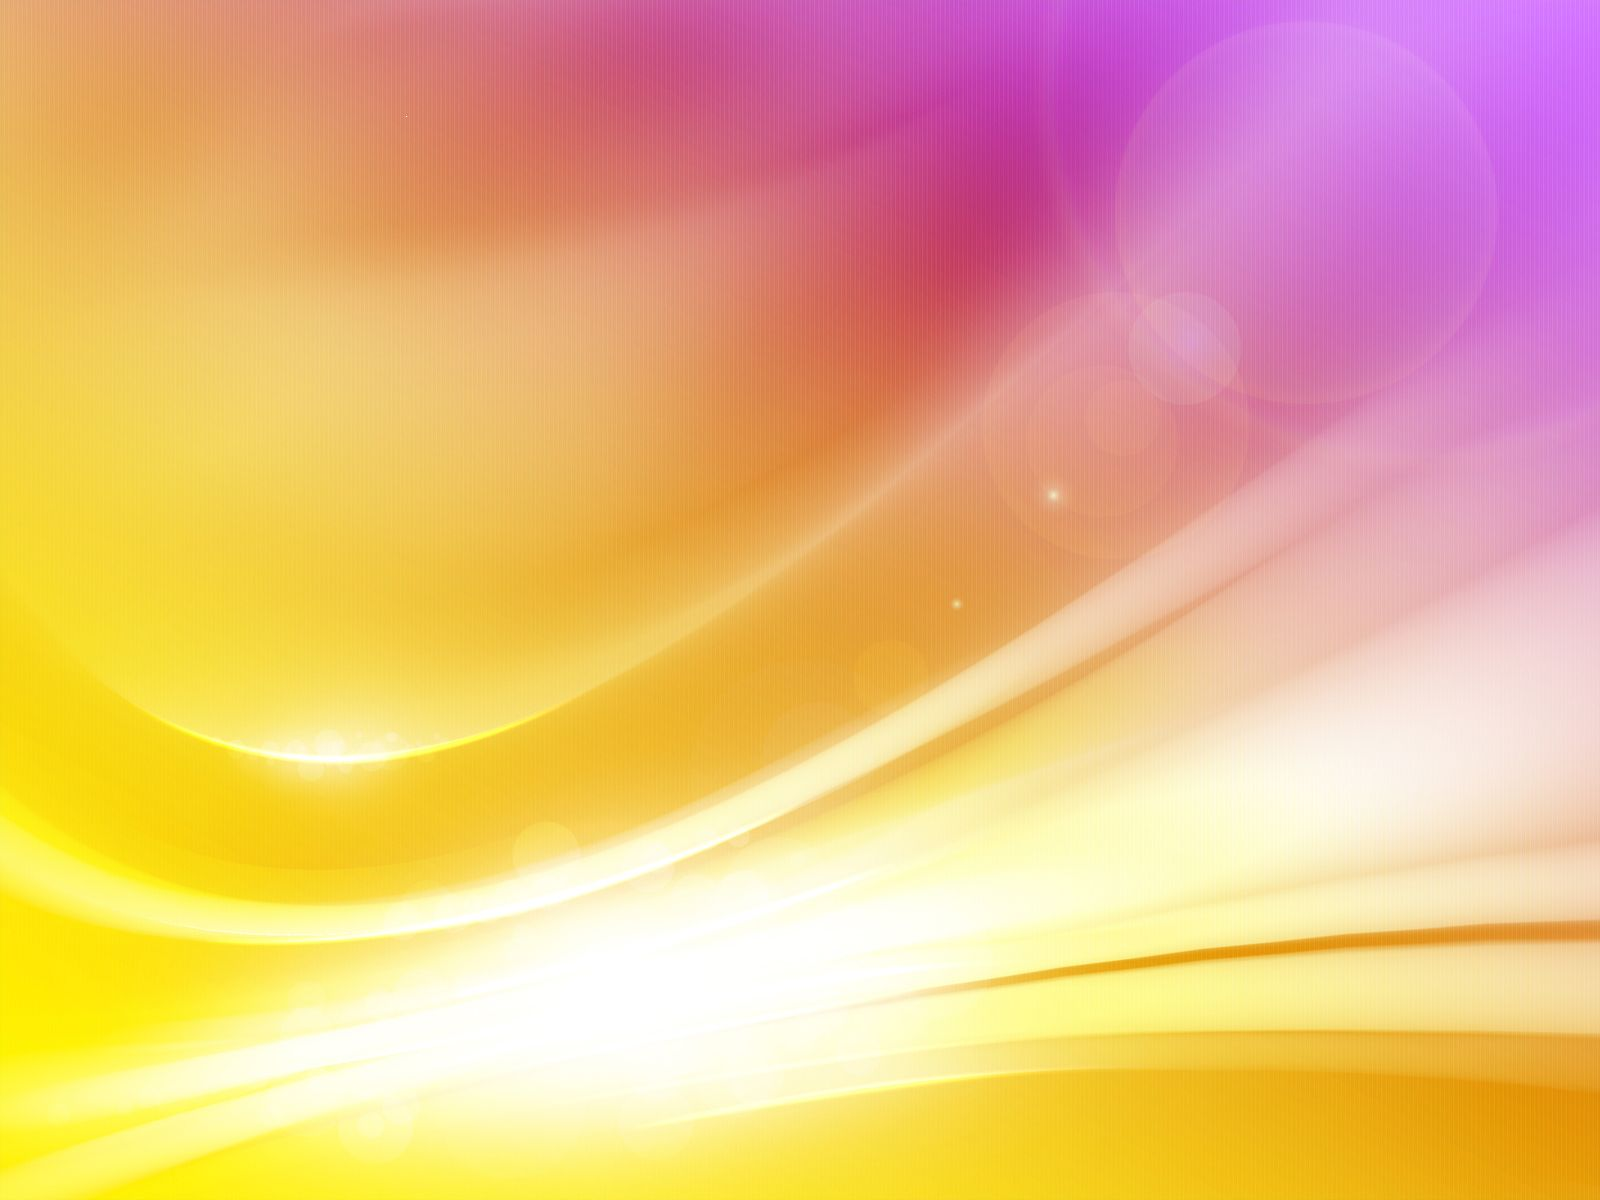 Yellow wallpaper .wallpapersfree to Ritashi on